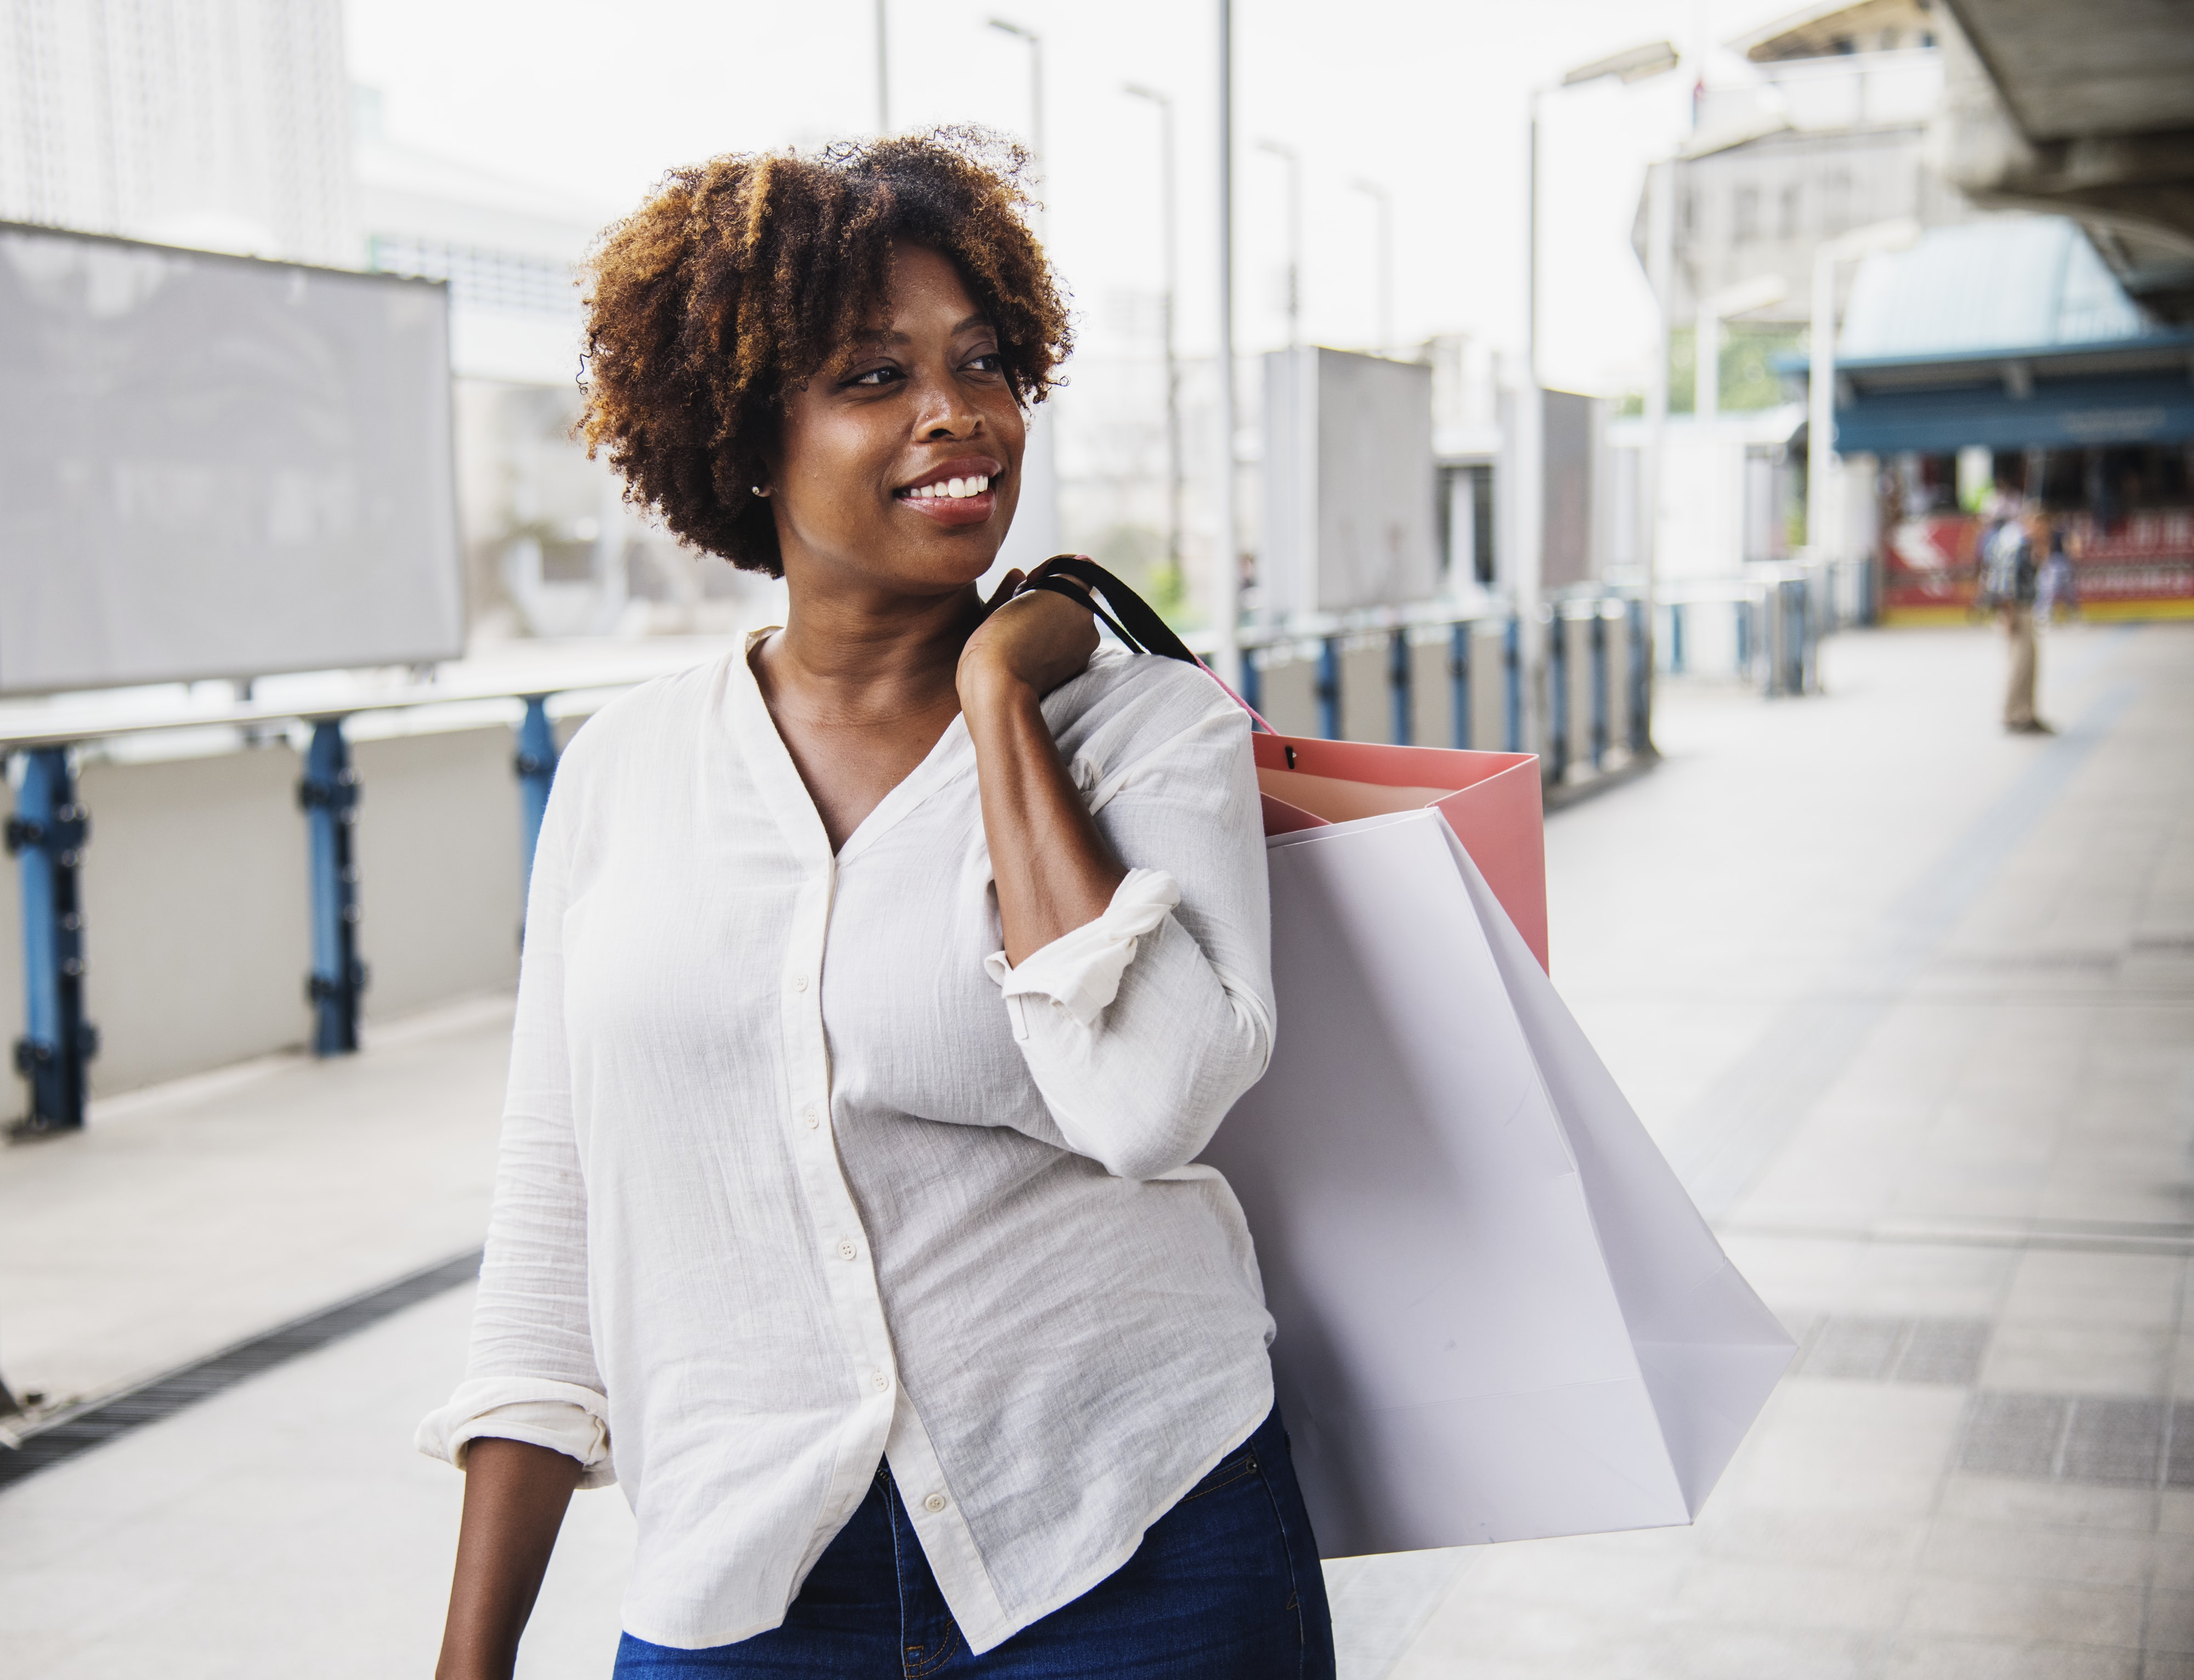 woman carrying paper bag walking on pathway